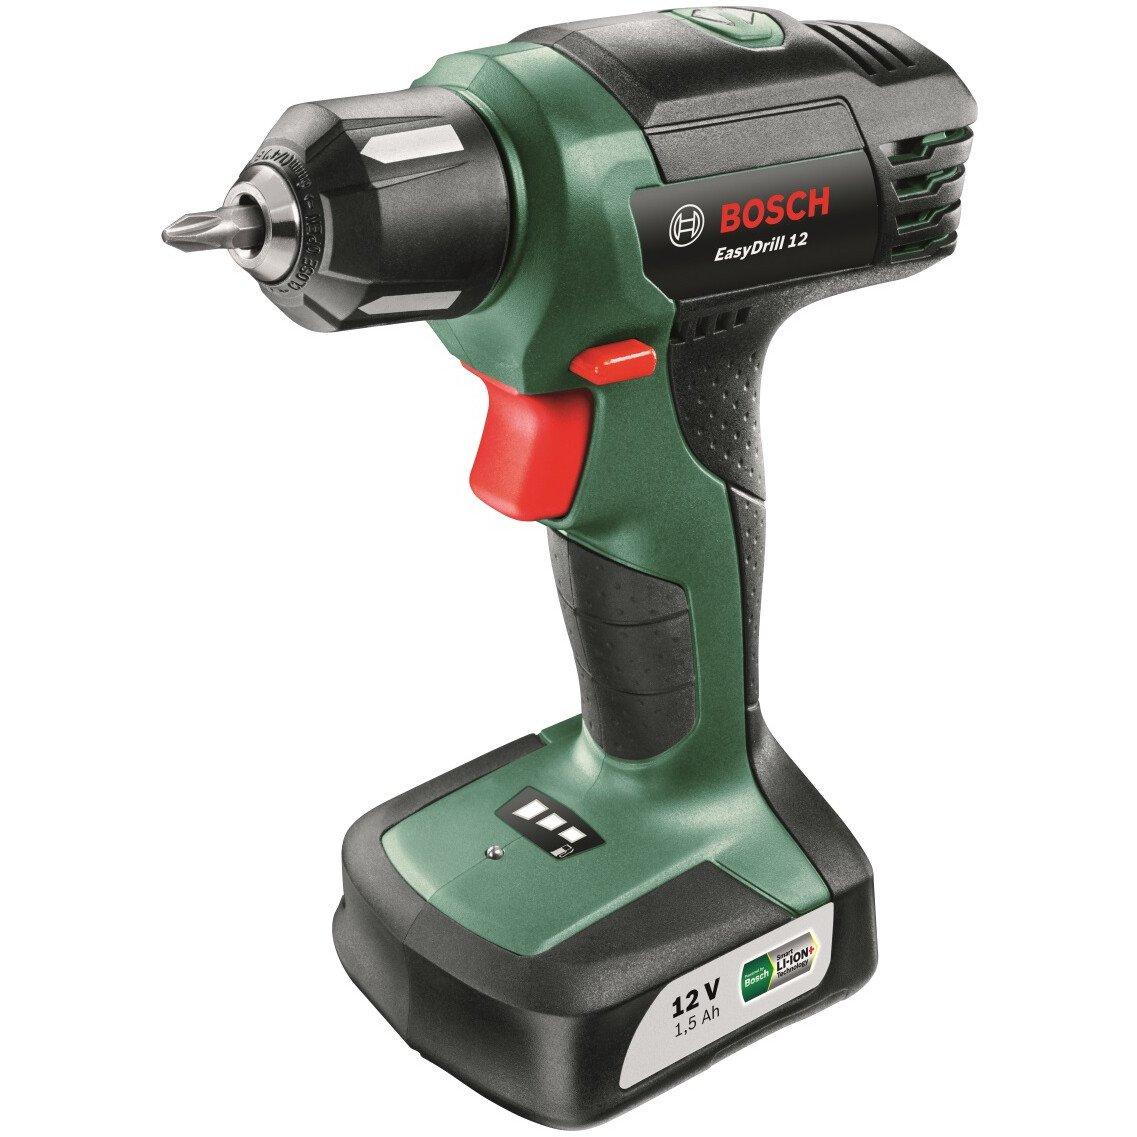 Bosch EasyDrill 12 12V Drill/Driver  1x 1.5Ah Integrated Battery in Carton